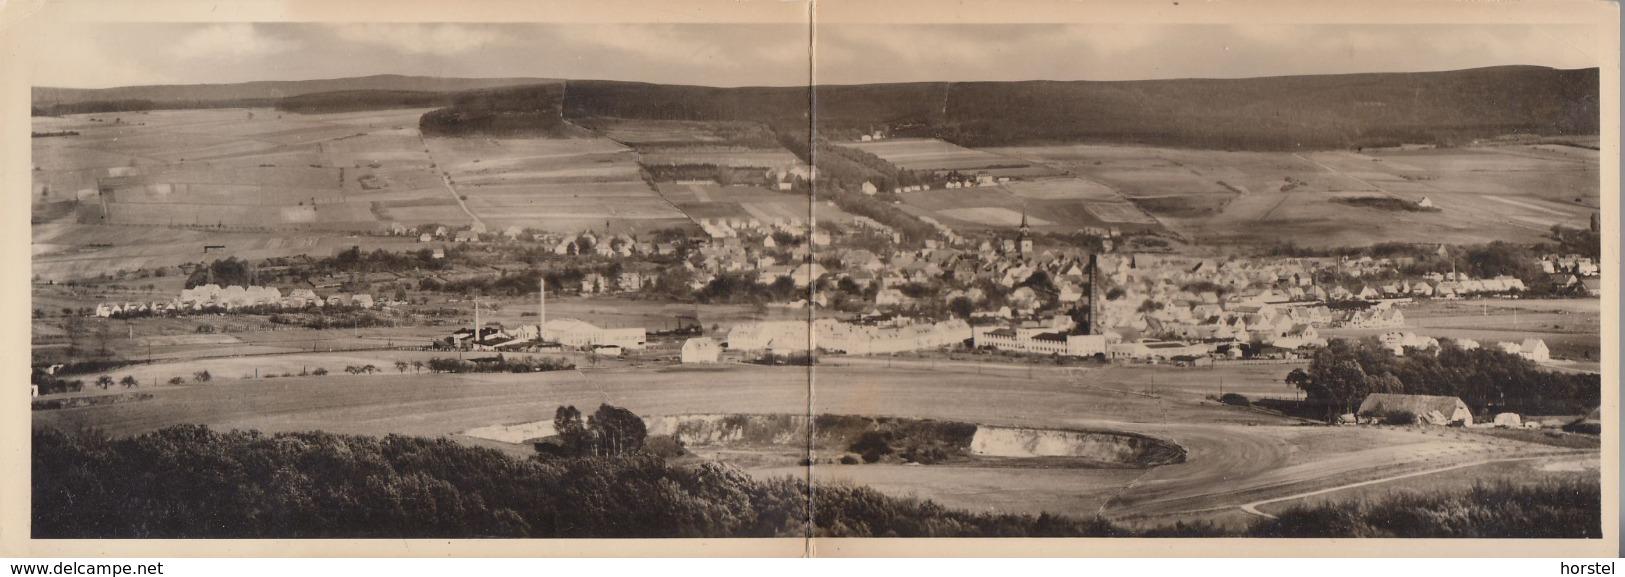 D-31848 Bad Münder - Totalansicht ( Panoramakarte- Klappkarte) - Bombentrichter ? - Hameln (Pyrmont)